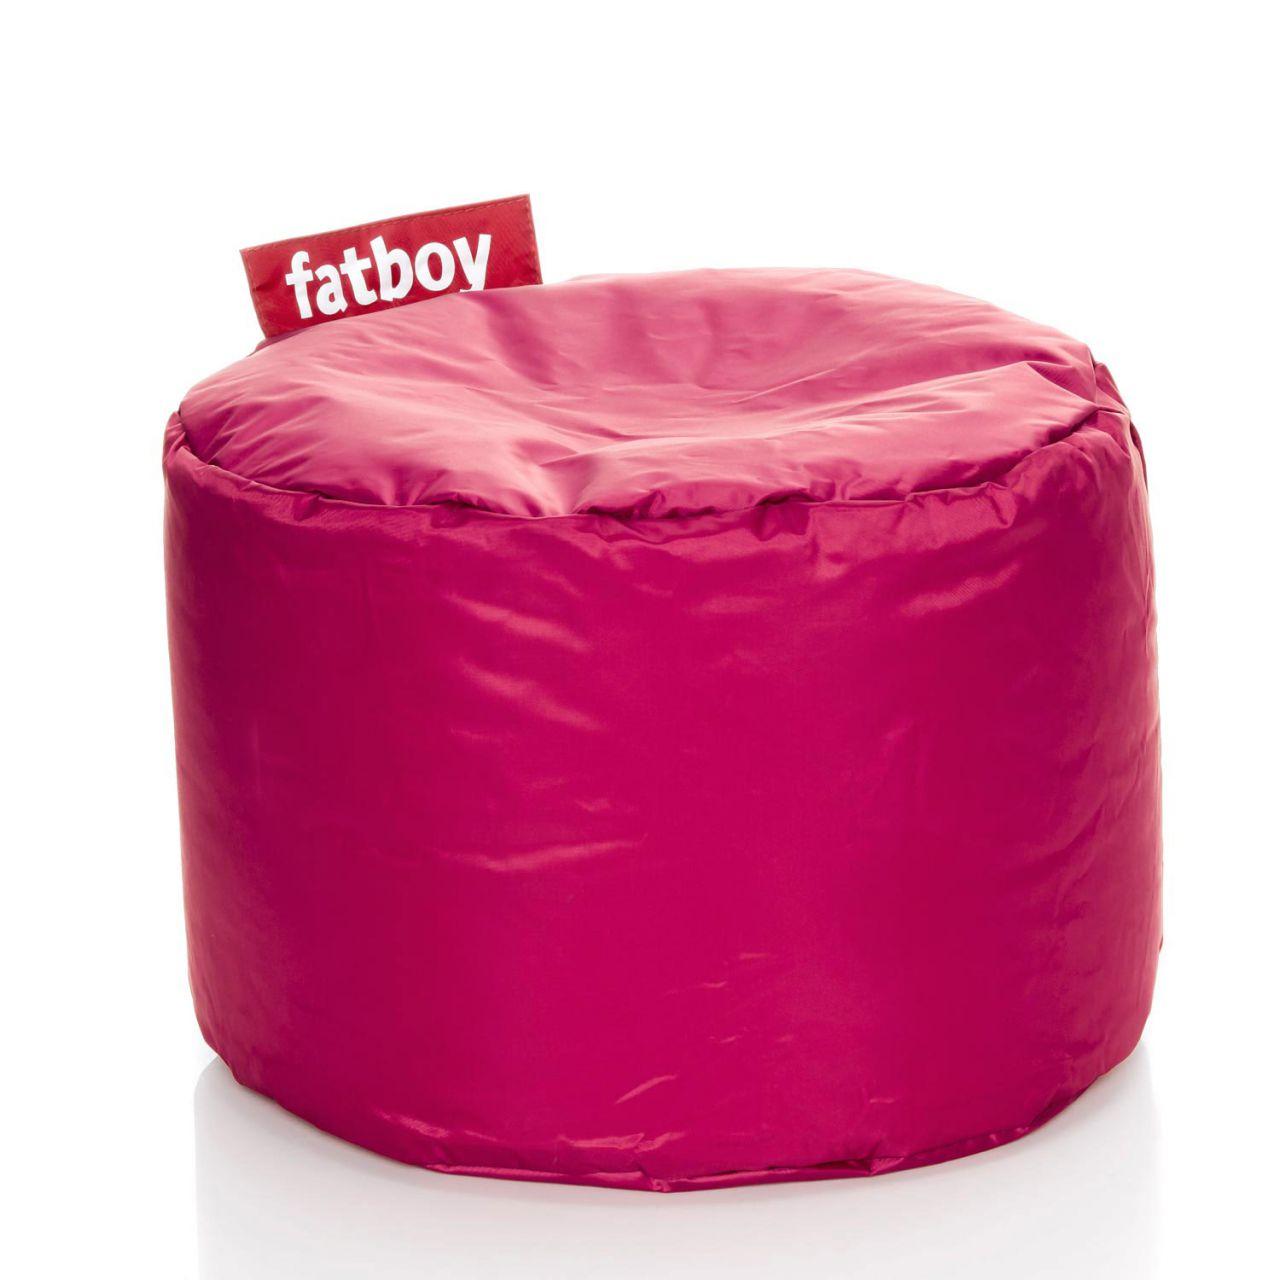 Fatboy - Point Sitzhocker 900.0141